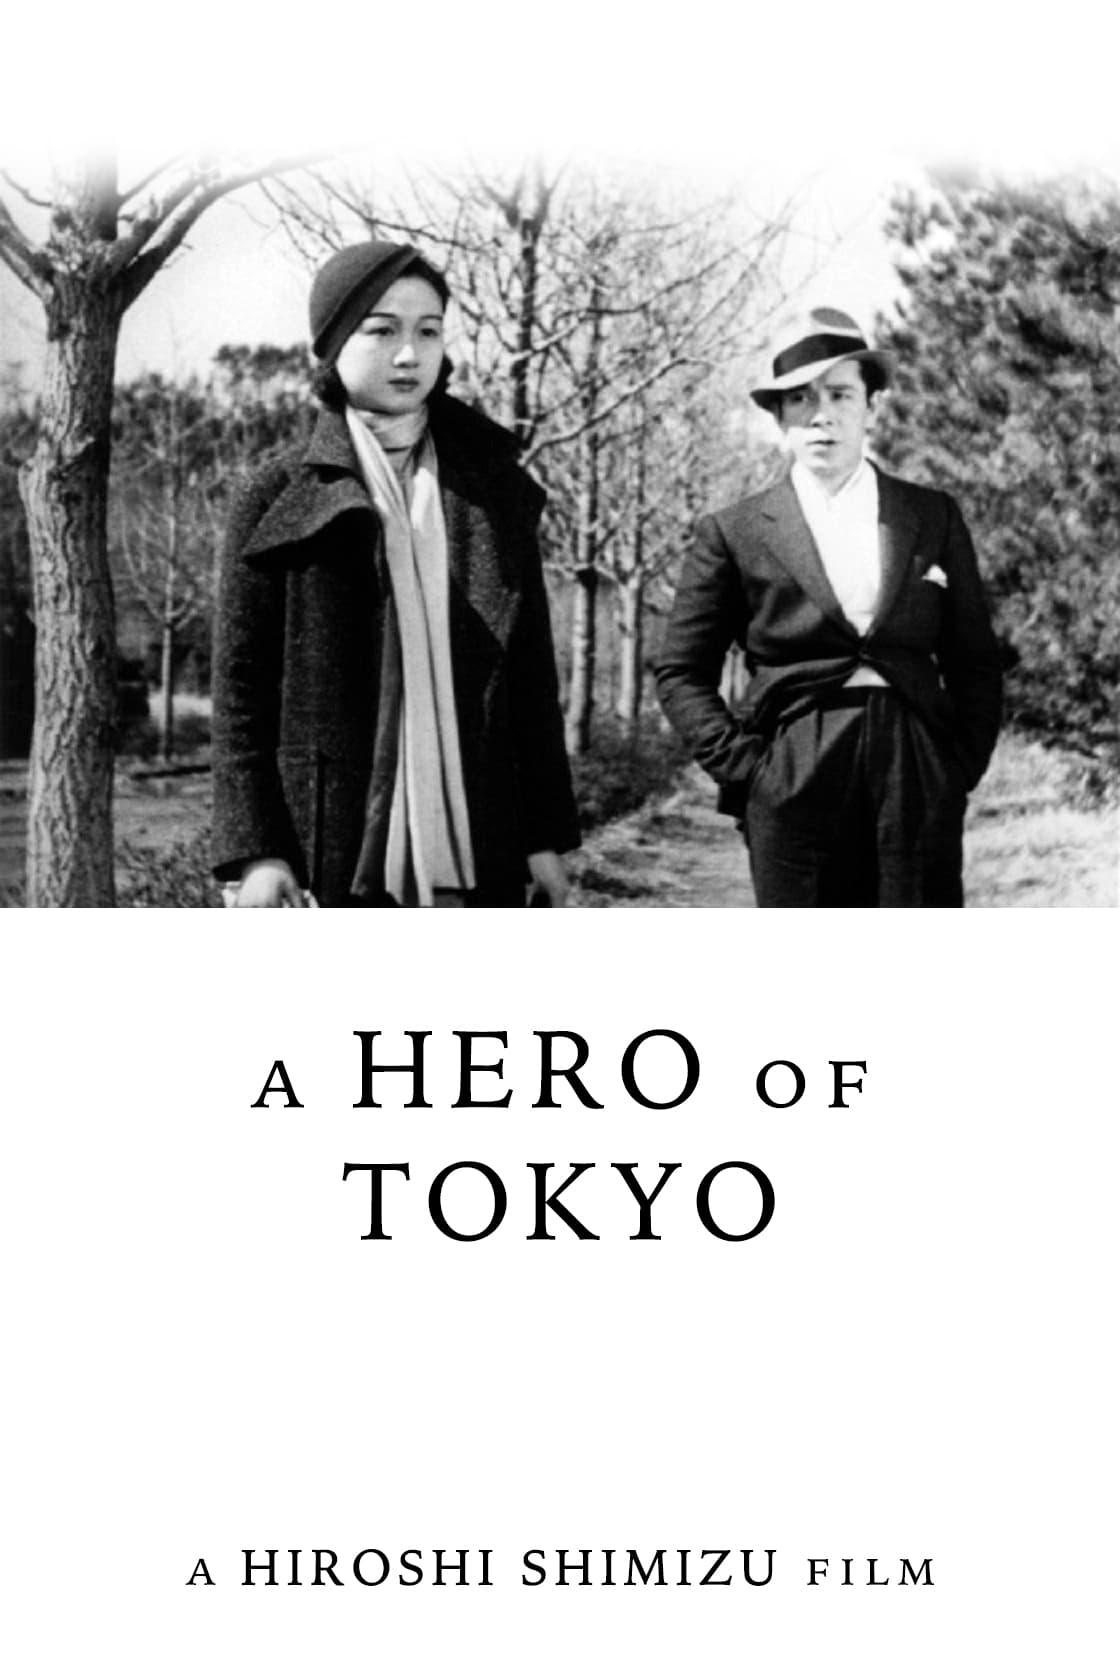 A Hero of Tokyo